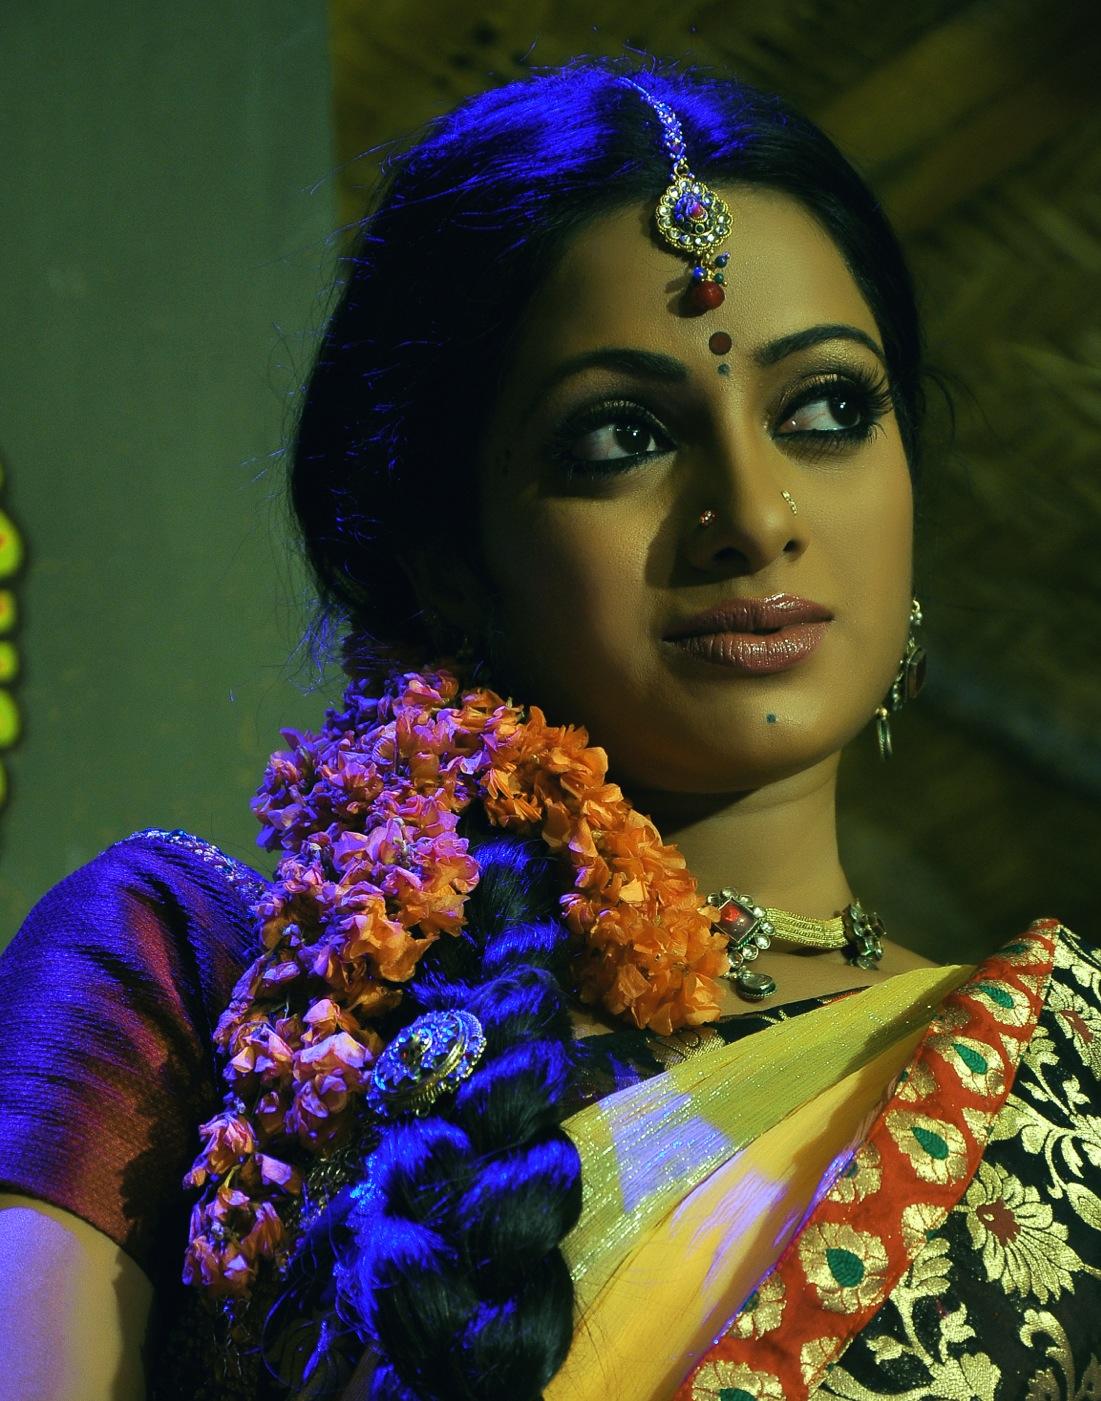 New Wap: Telugu And Tamil Actress Karthika Wallpapers and